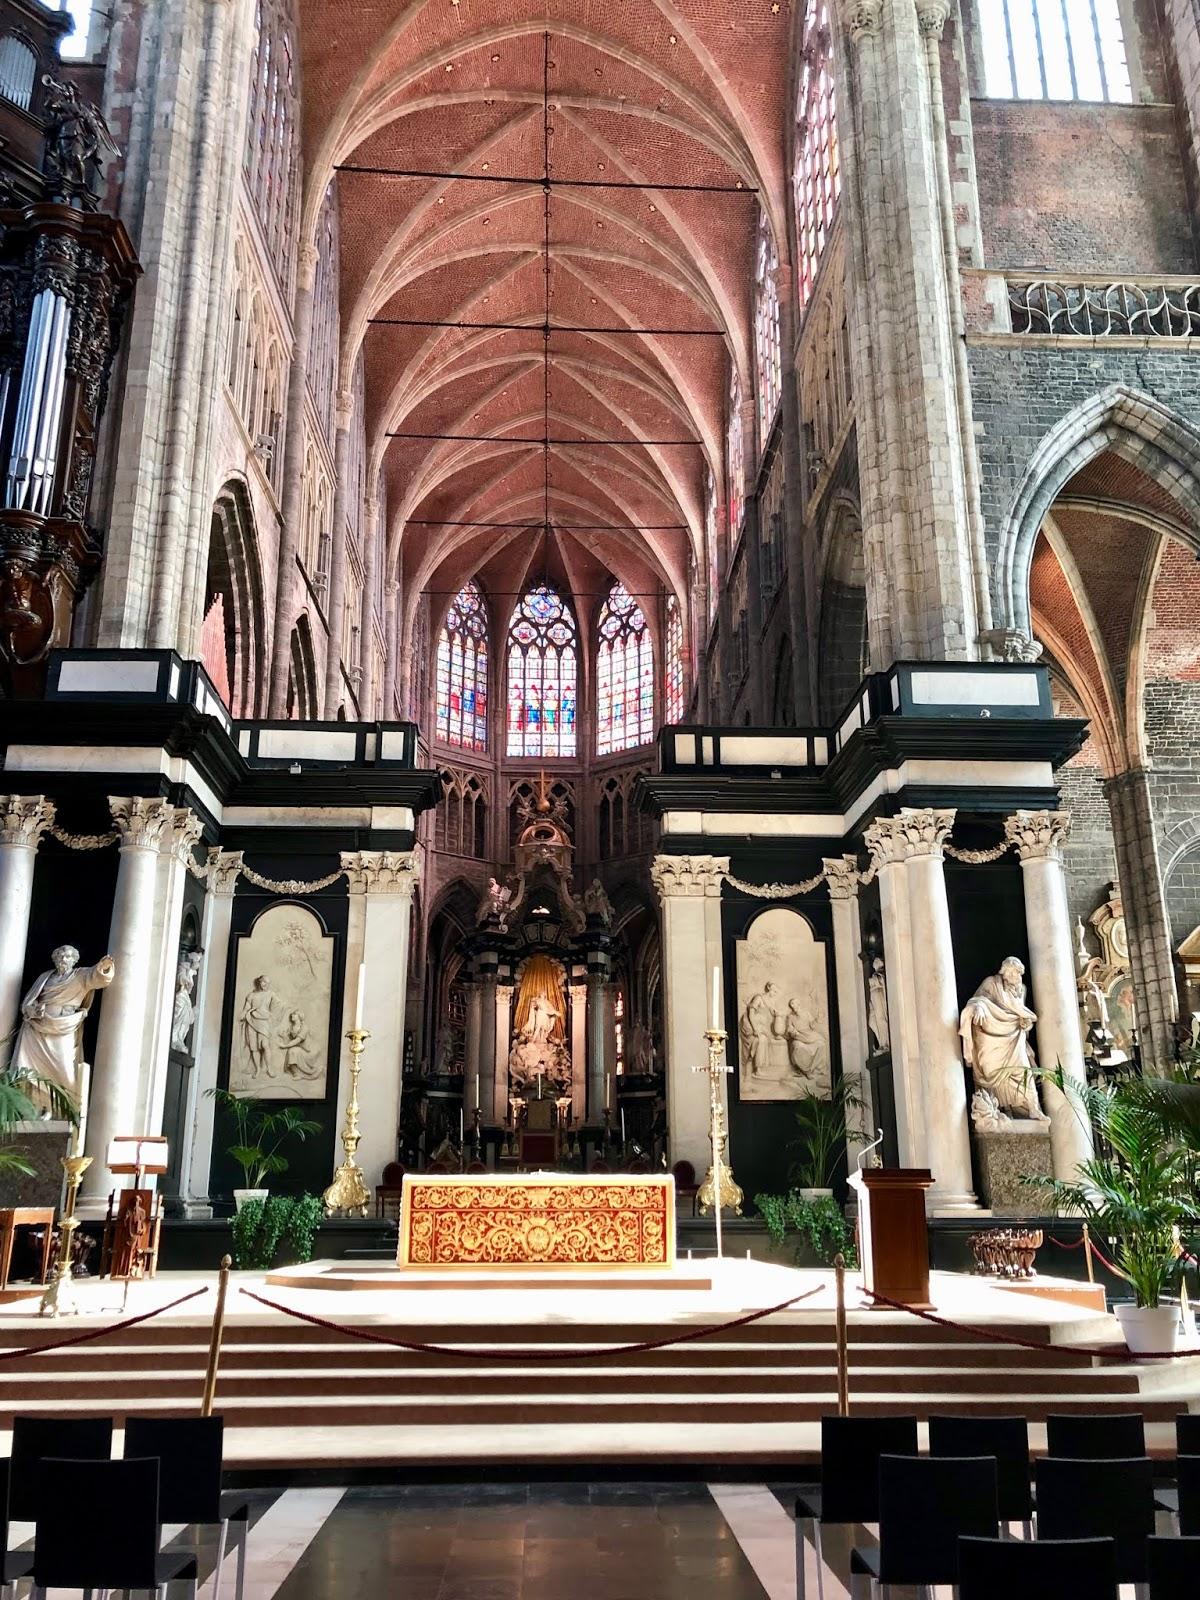 Saint Bavo's Cathedral in Gent, Belgium